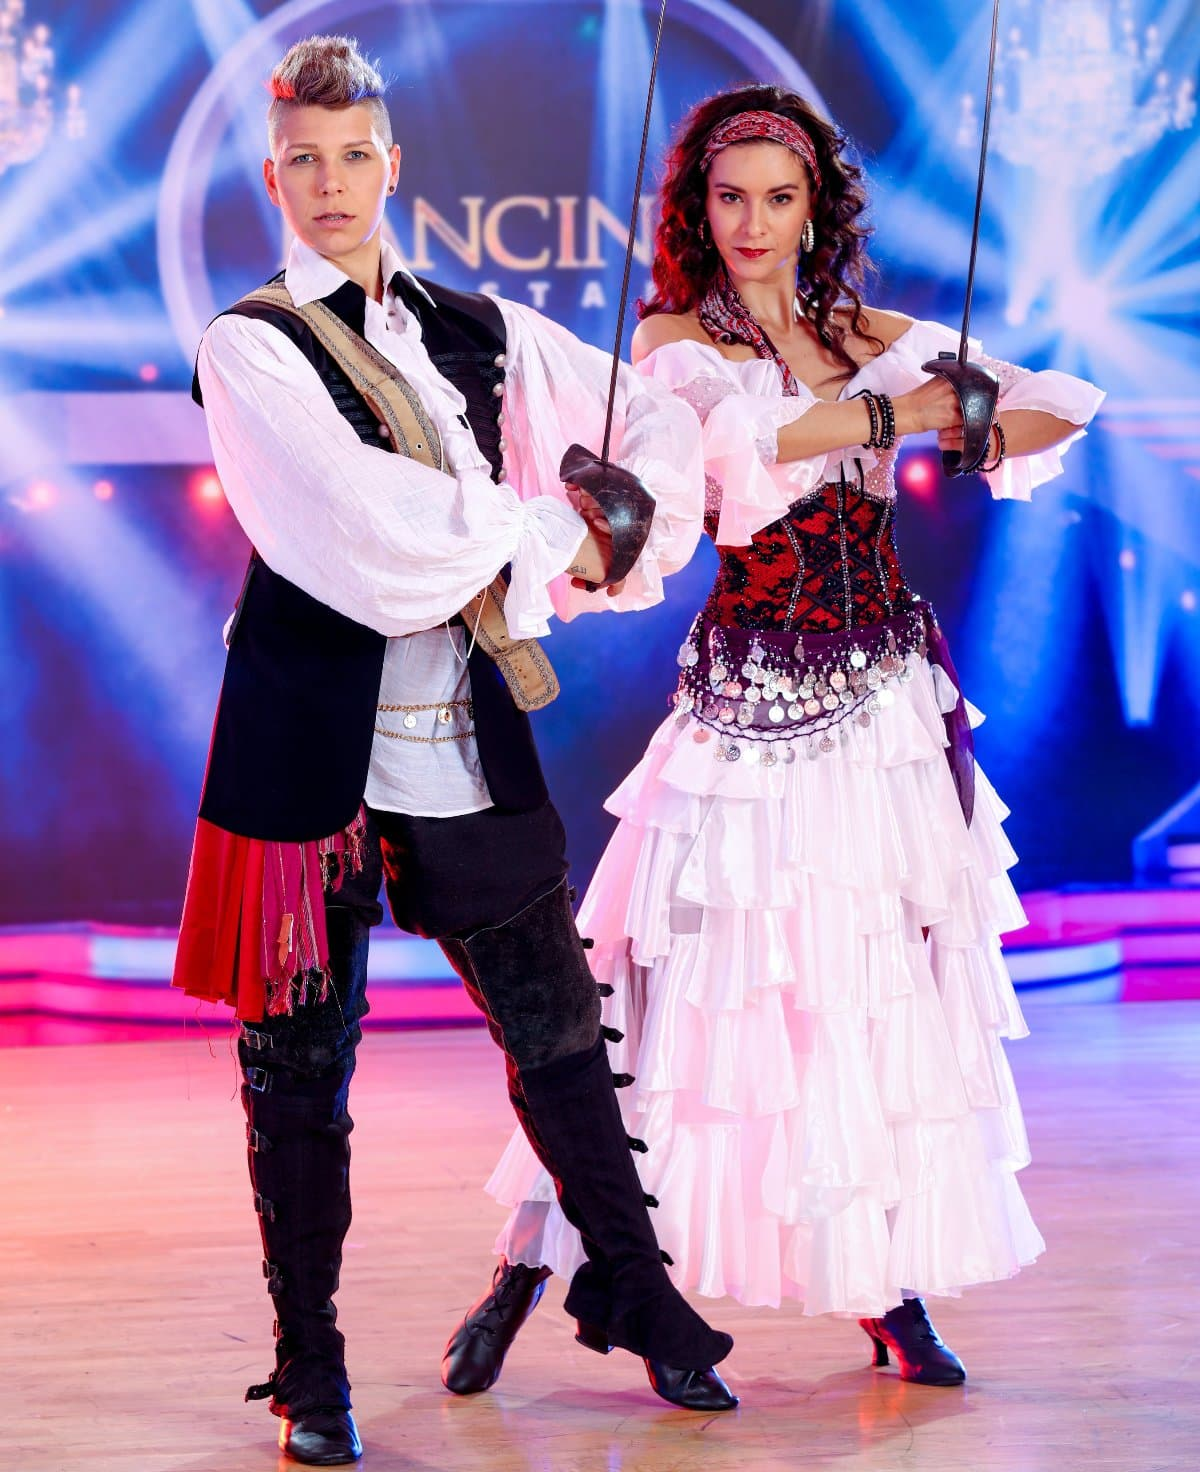 Virginia Ernst - Alexandra Scheriau bei den Dancing Stars am 26.4.2019